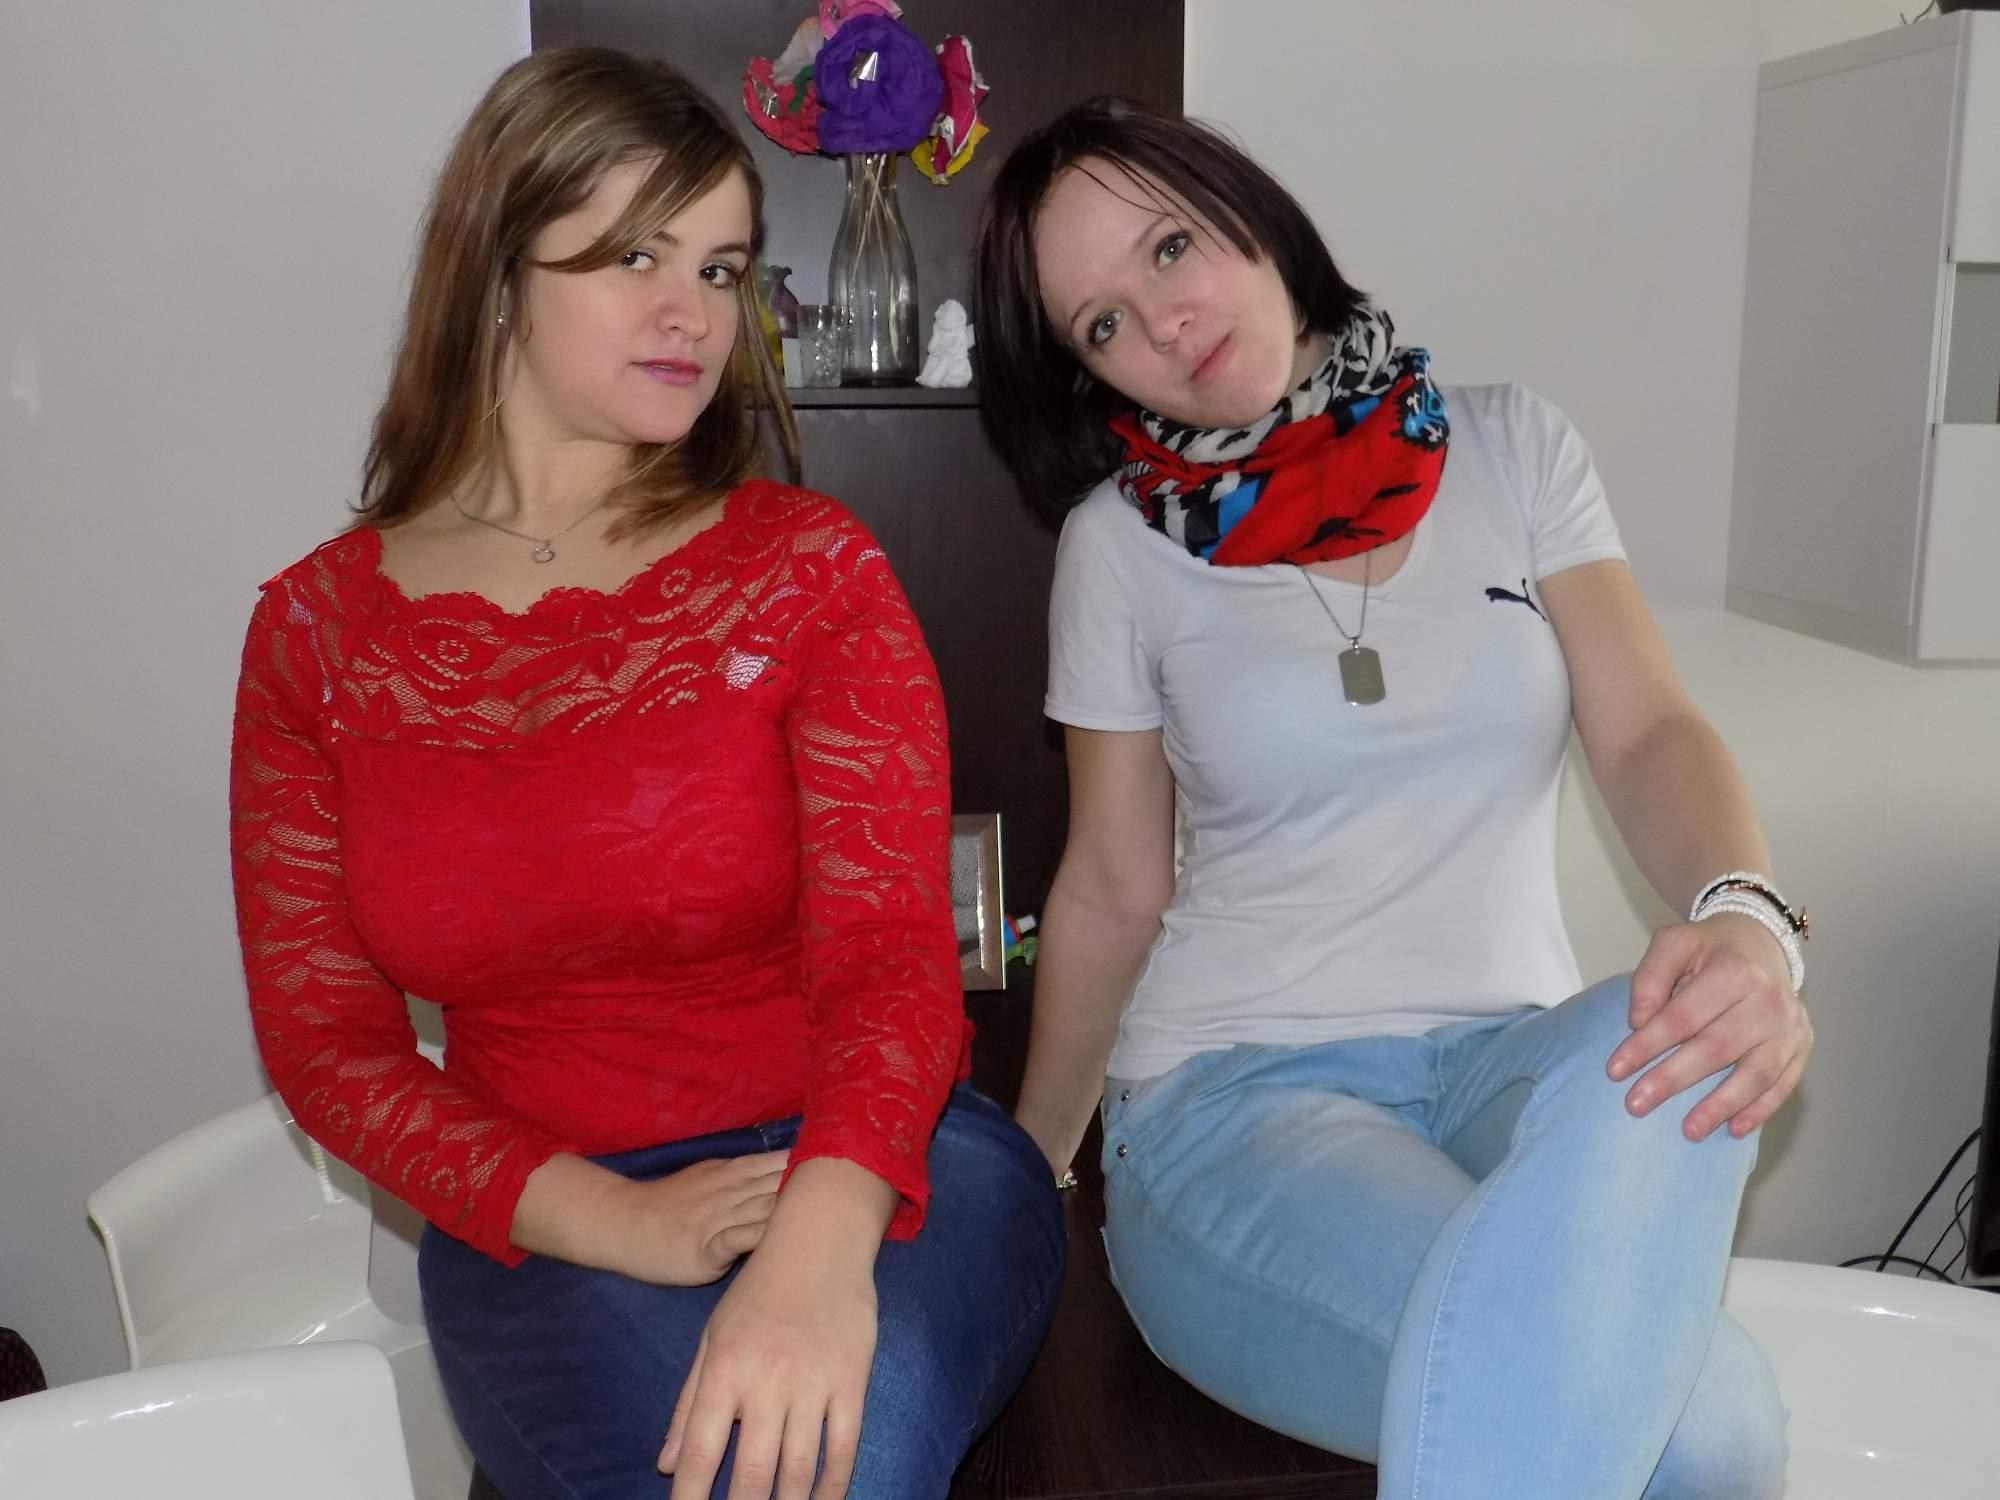 http://img25.rajce.idnes.cz/d2502/13/13862/13862137_c5559384bb63a400f5d8327efbaafba8/images/DSCN1515.jpg